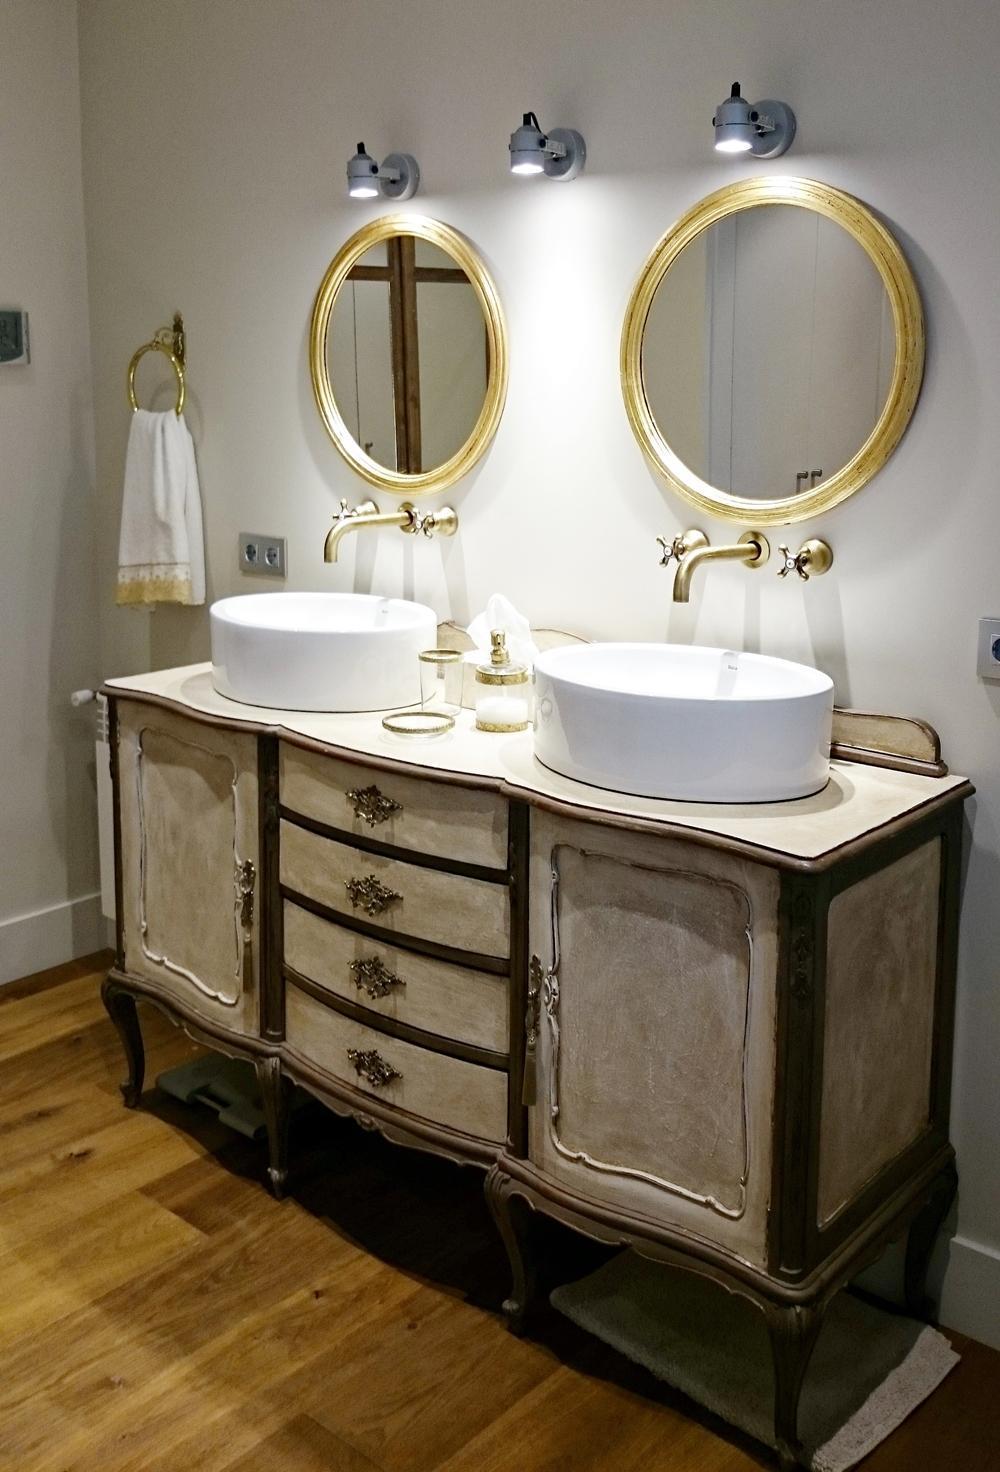 Mueble de ba o vintage estilo luis xv tienda online de - Estilo vintage muebles ...